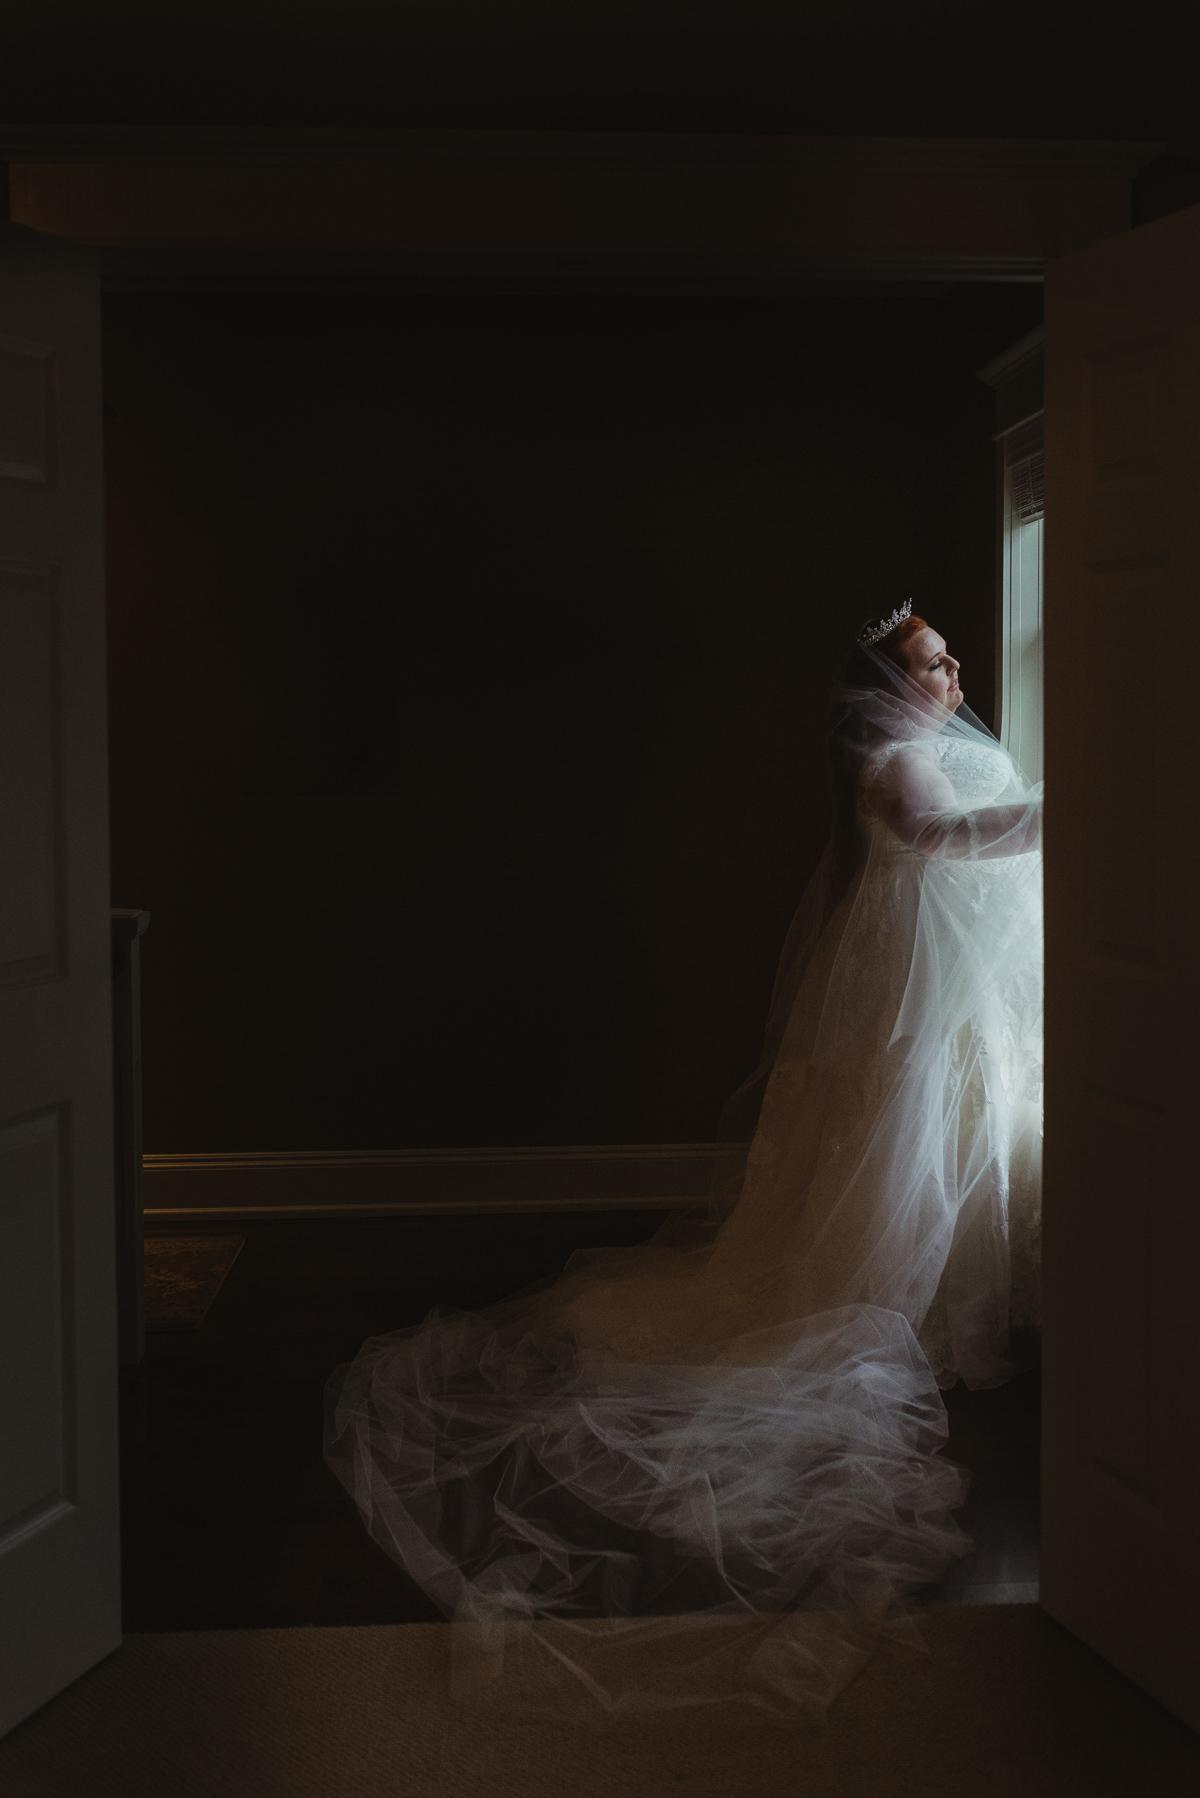 darling-mine-photography-vineyard-bride-swish-list-old-courthouse-niagara-on-the-lake-wedding-10.jpg